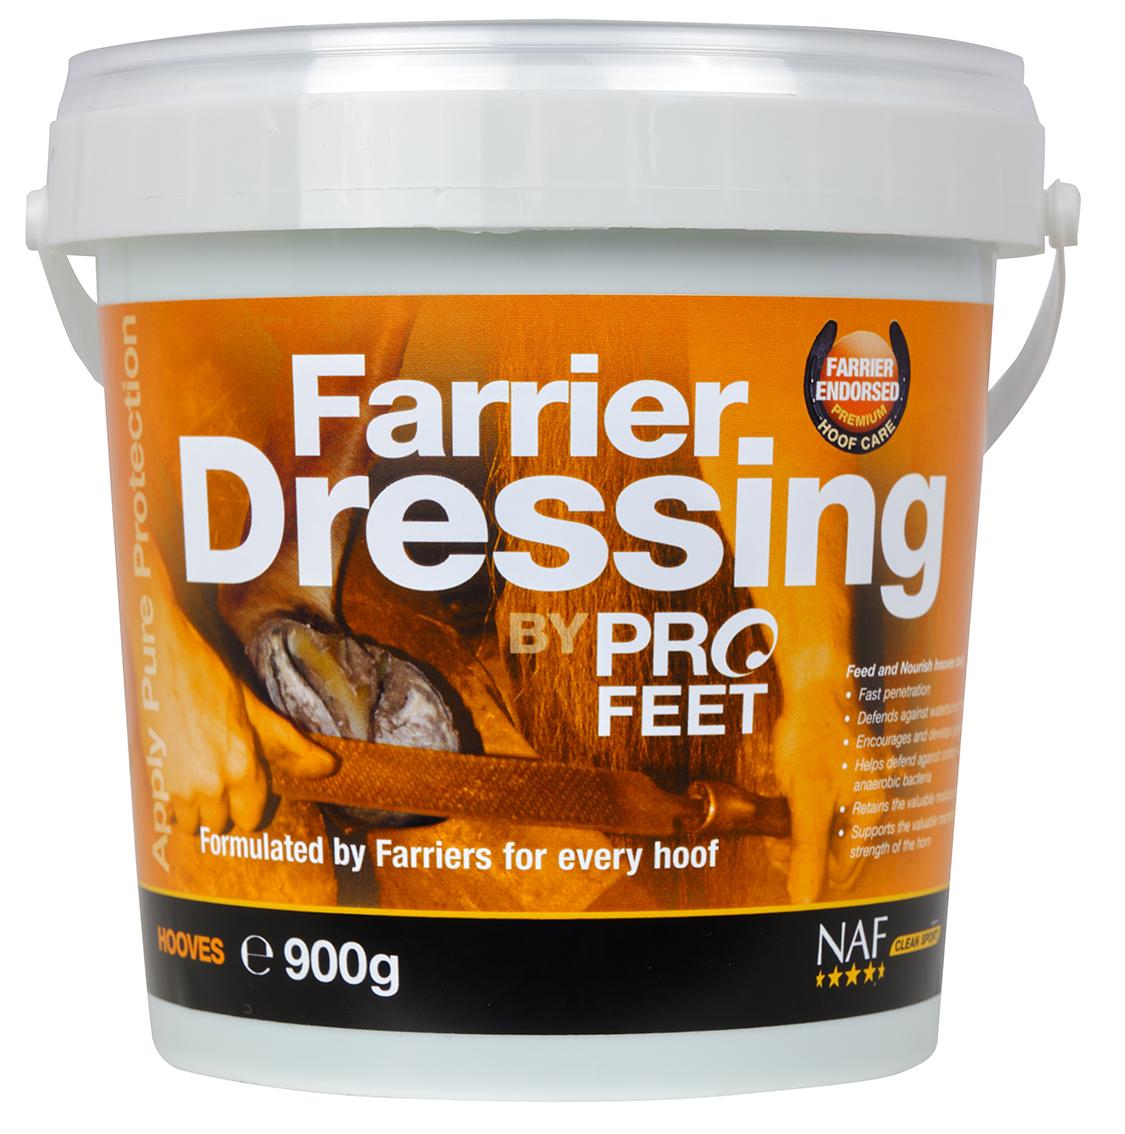 farrier-dressing-by-profeet-900g